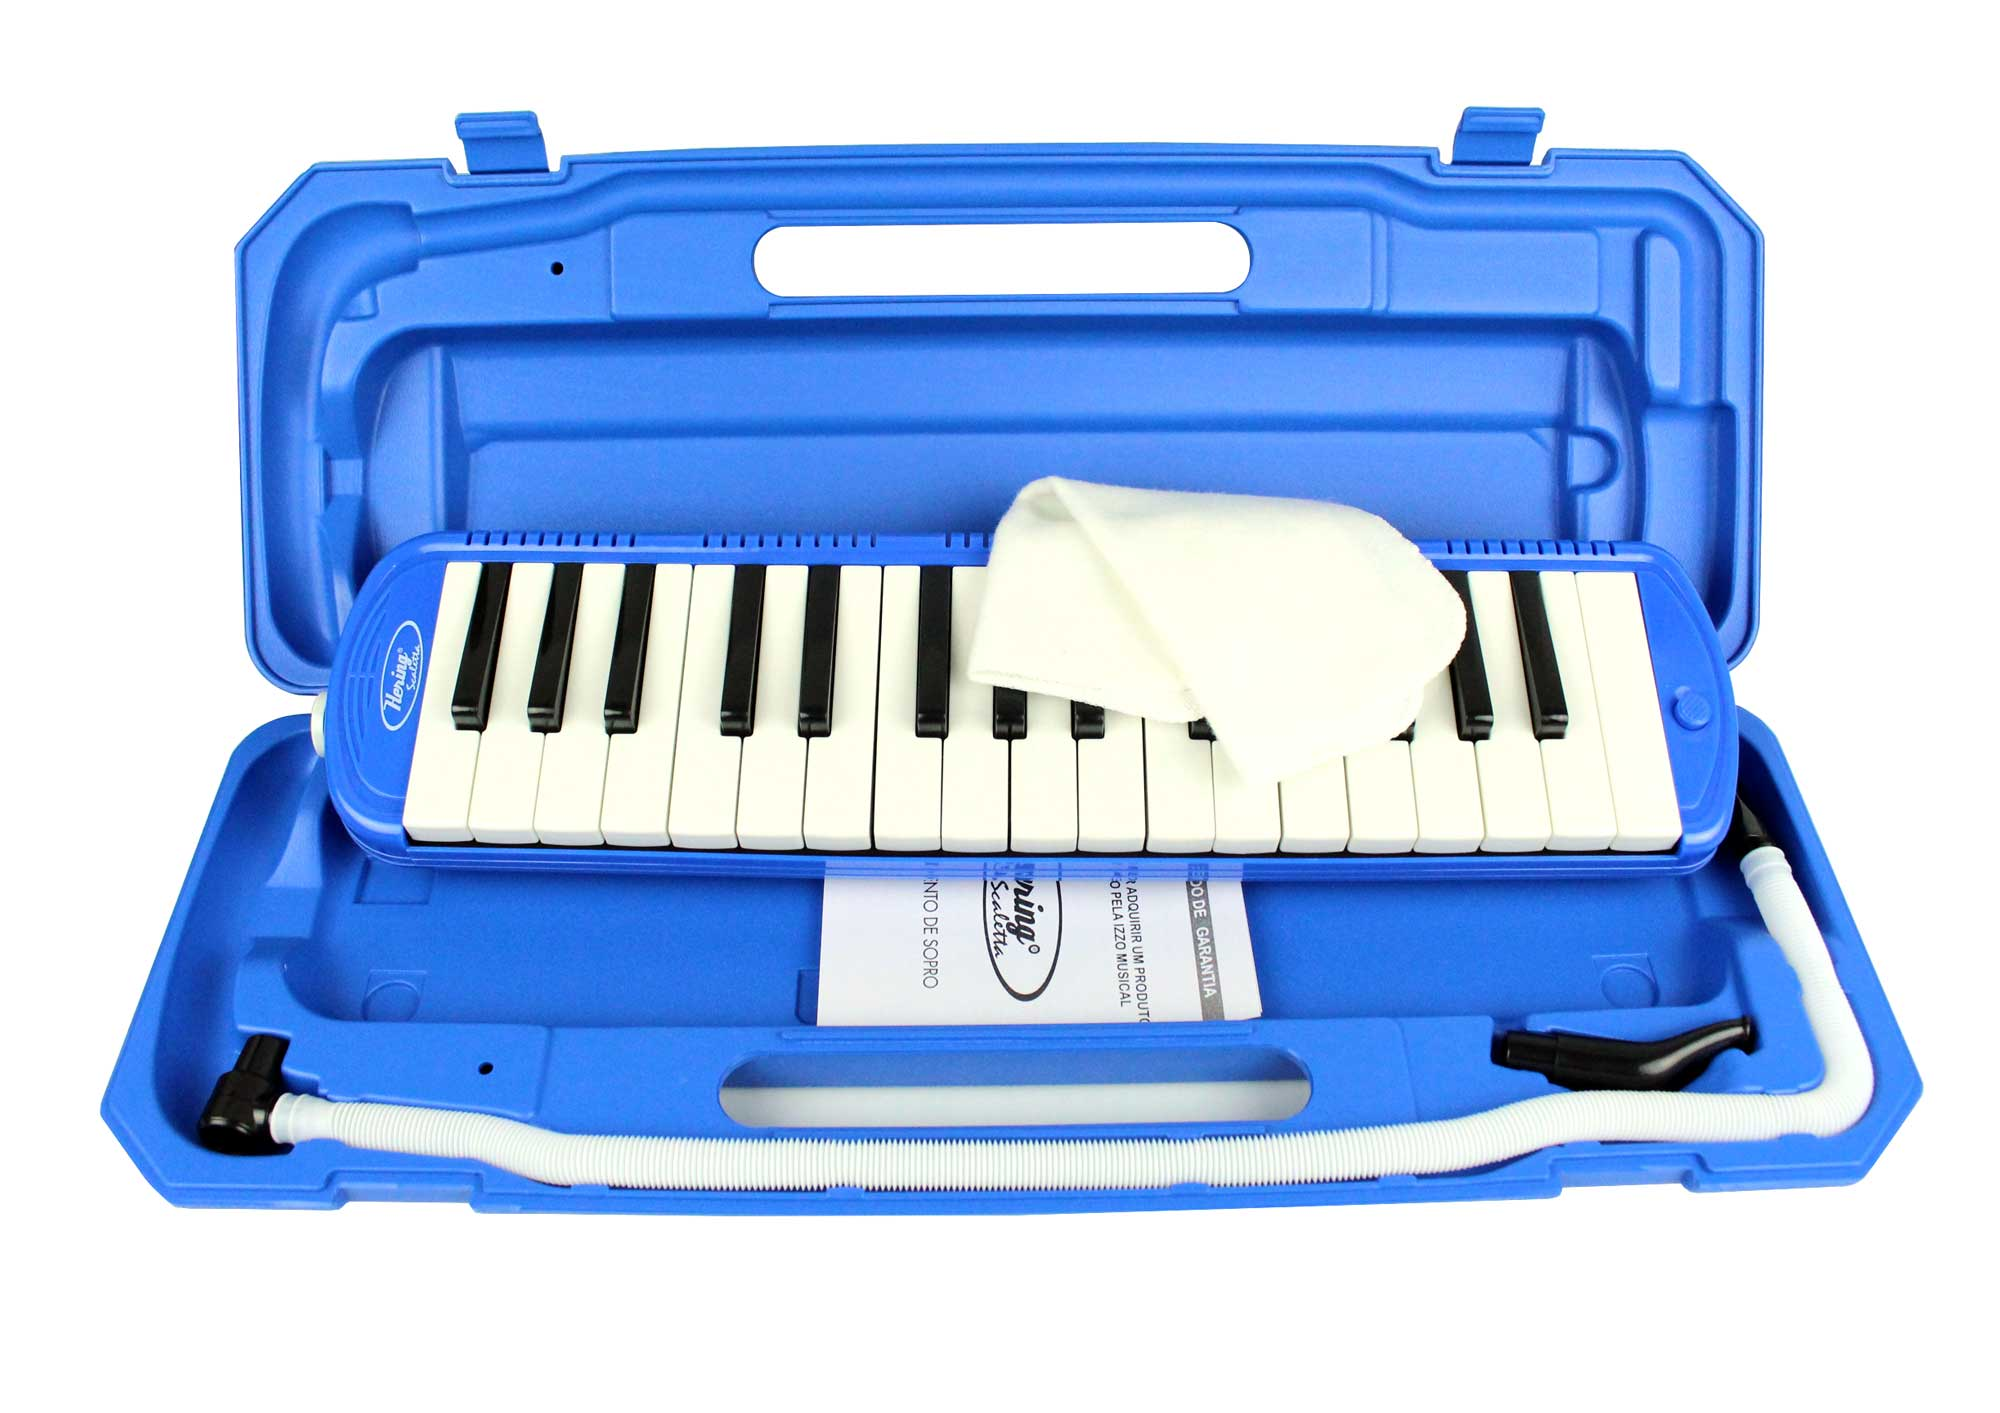 Escaleta melodica de 32 teclas na cor azul | Alcance de F a C | Hering | EH8862